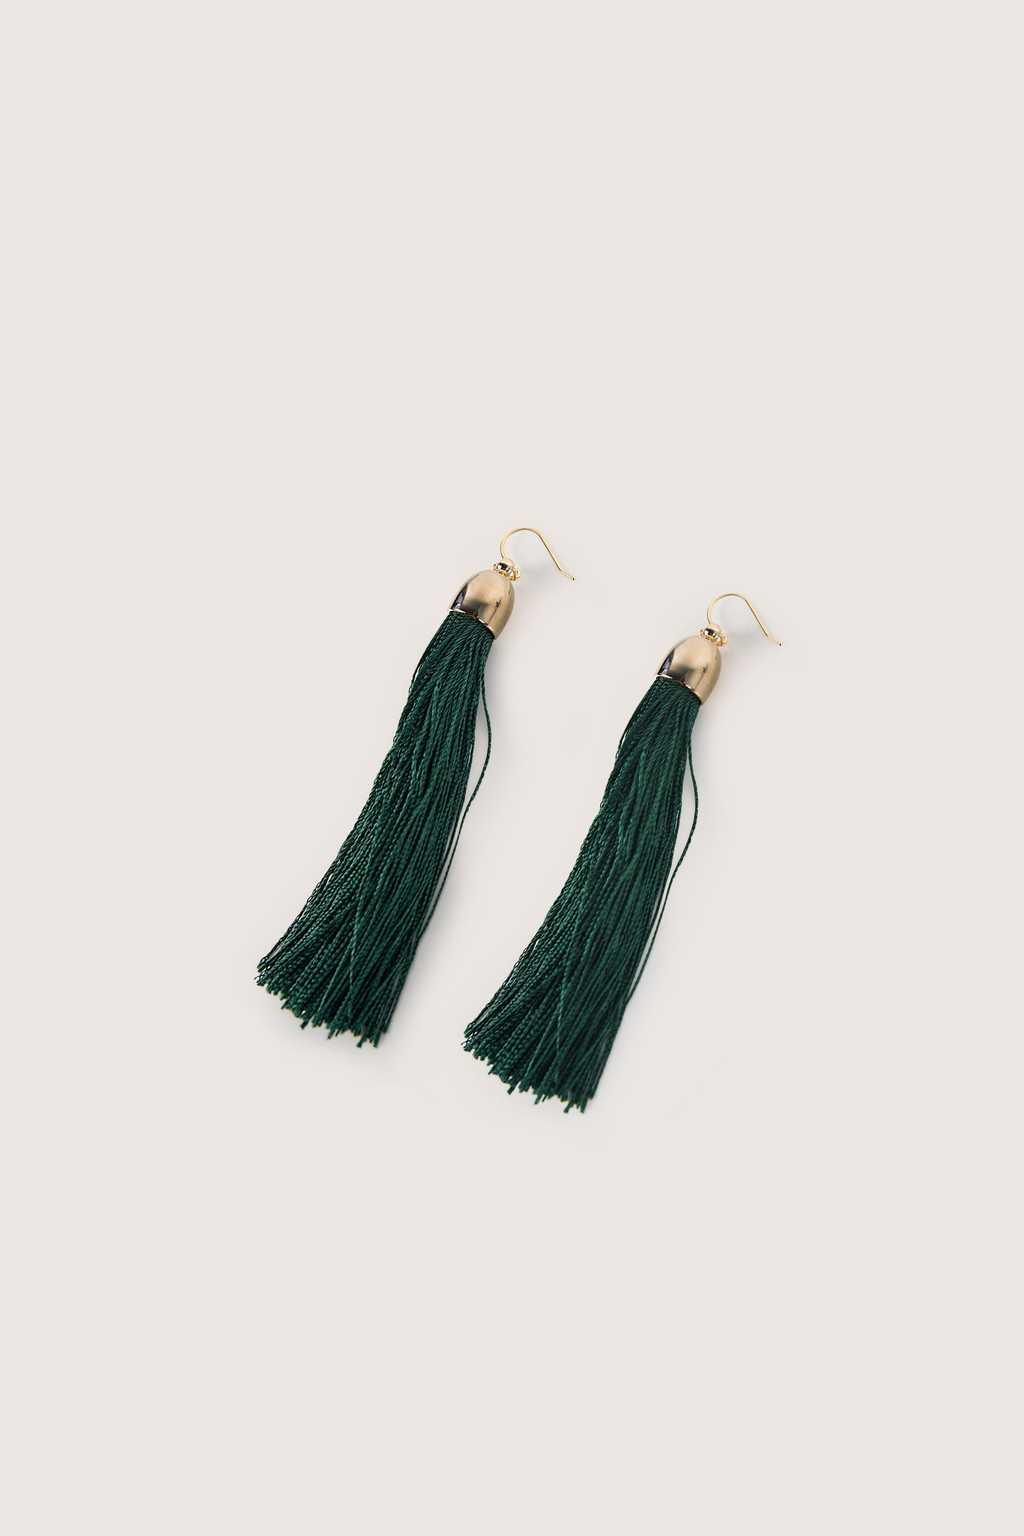 Earring H075 Green 4